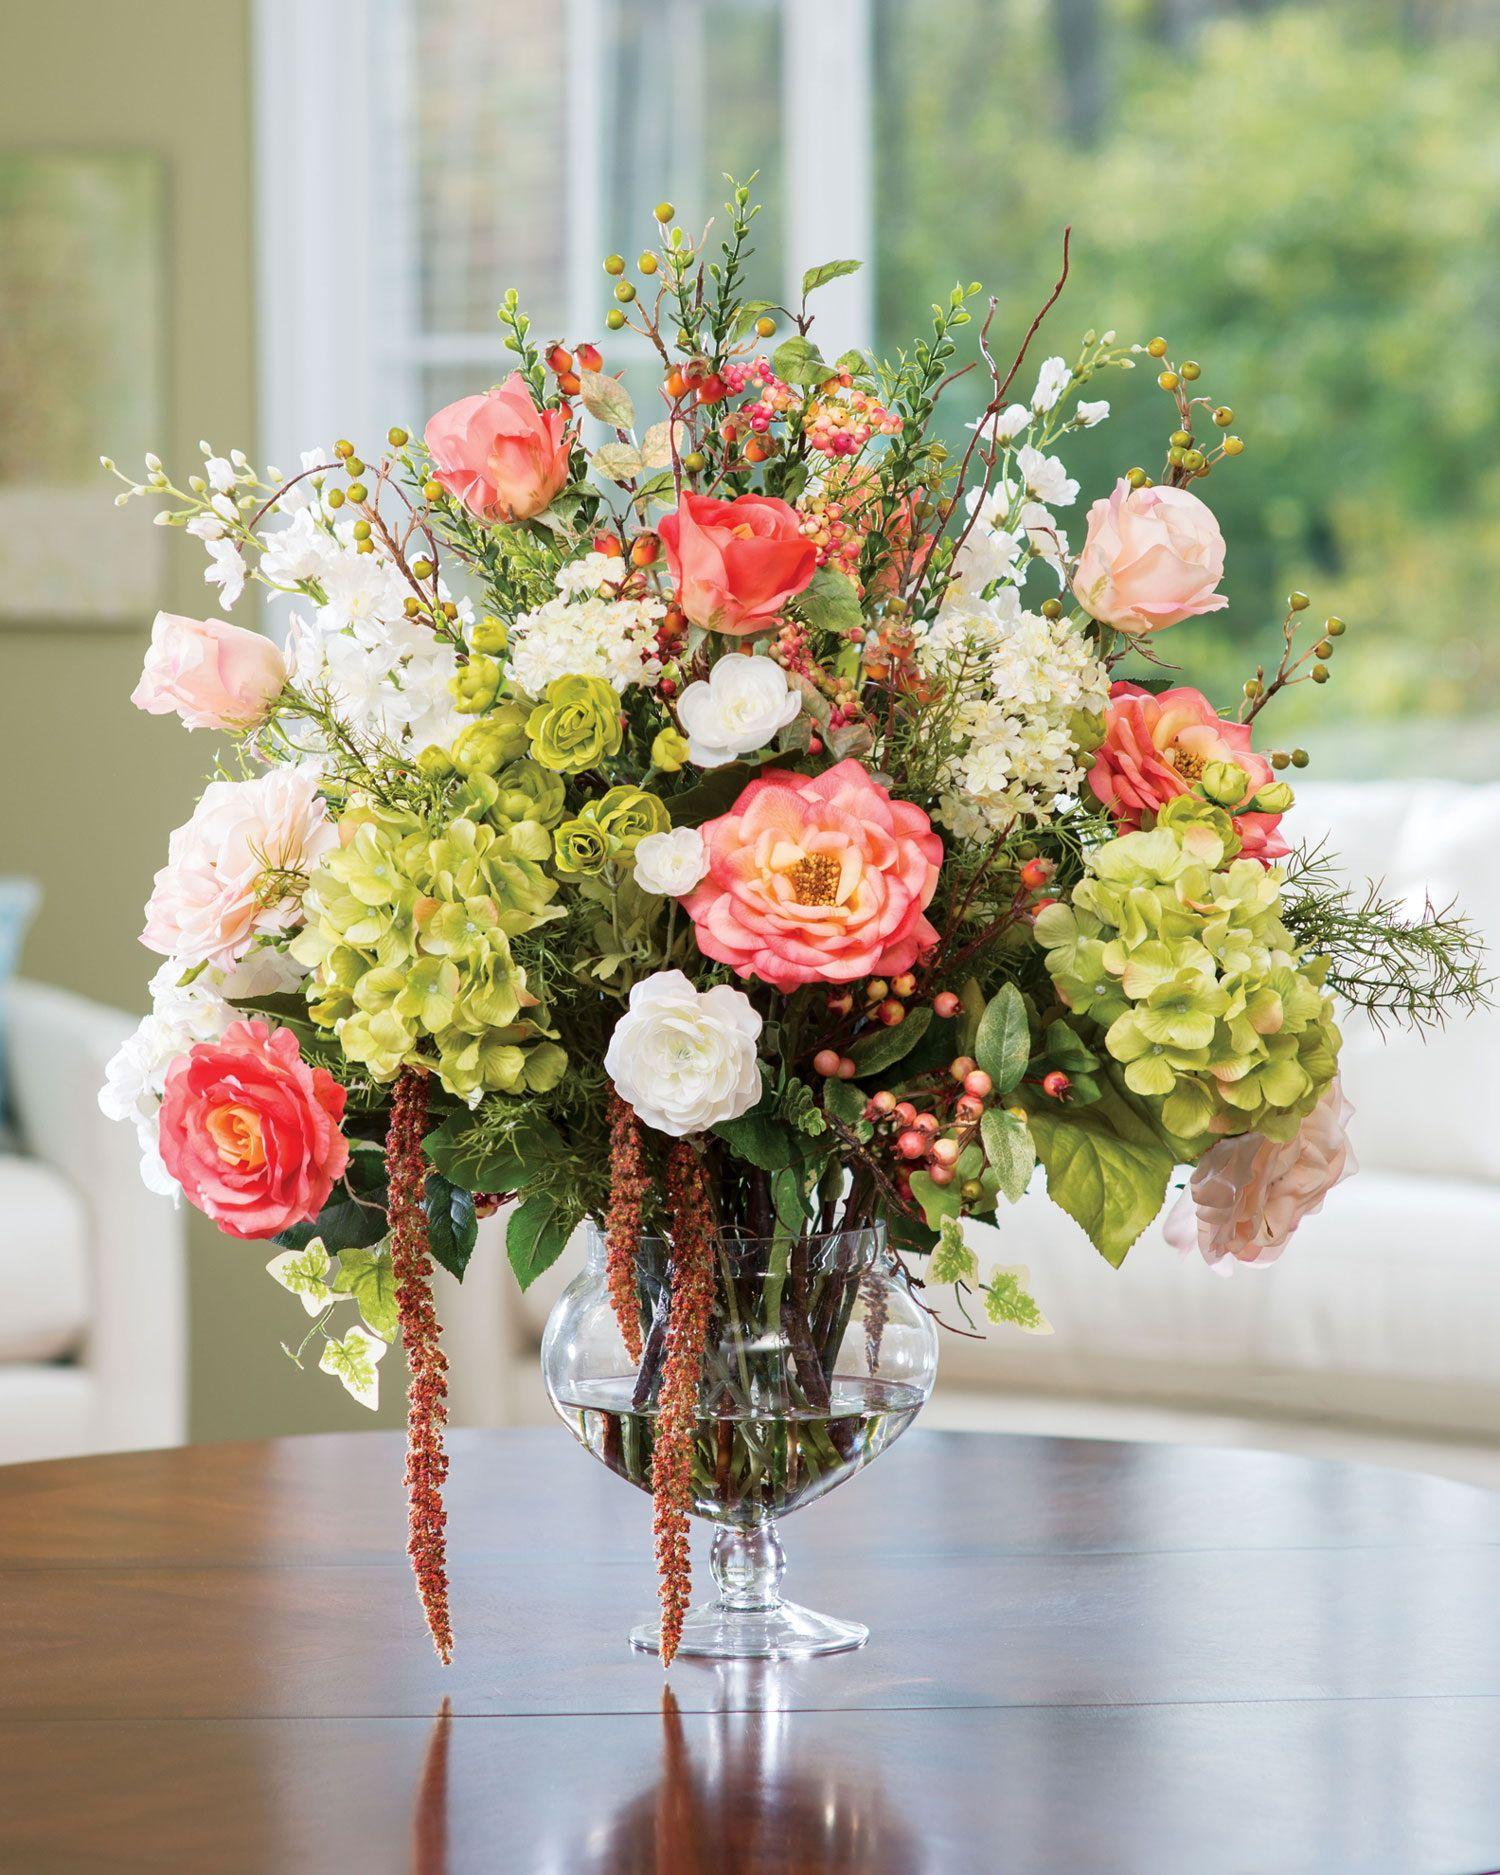 Роз картинки, дизайн флористика букетов